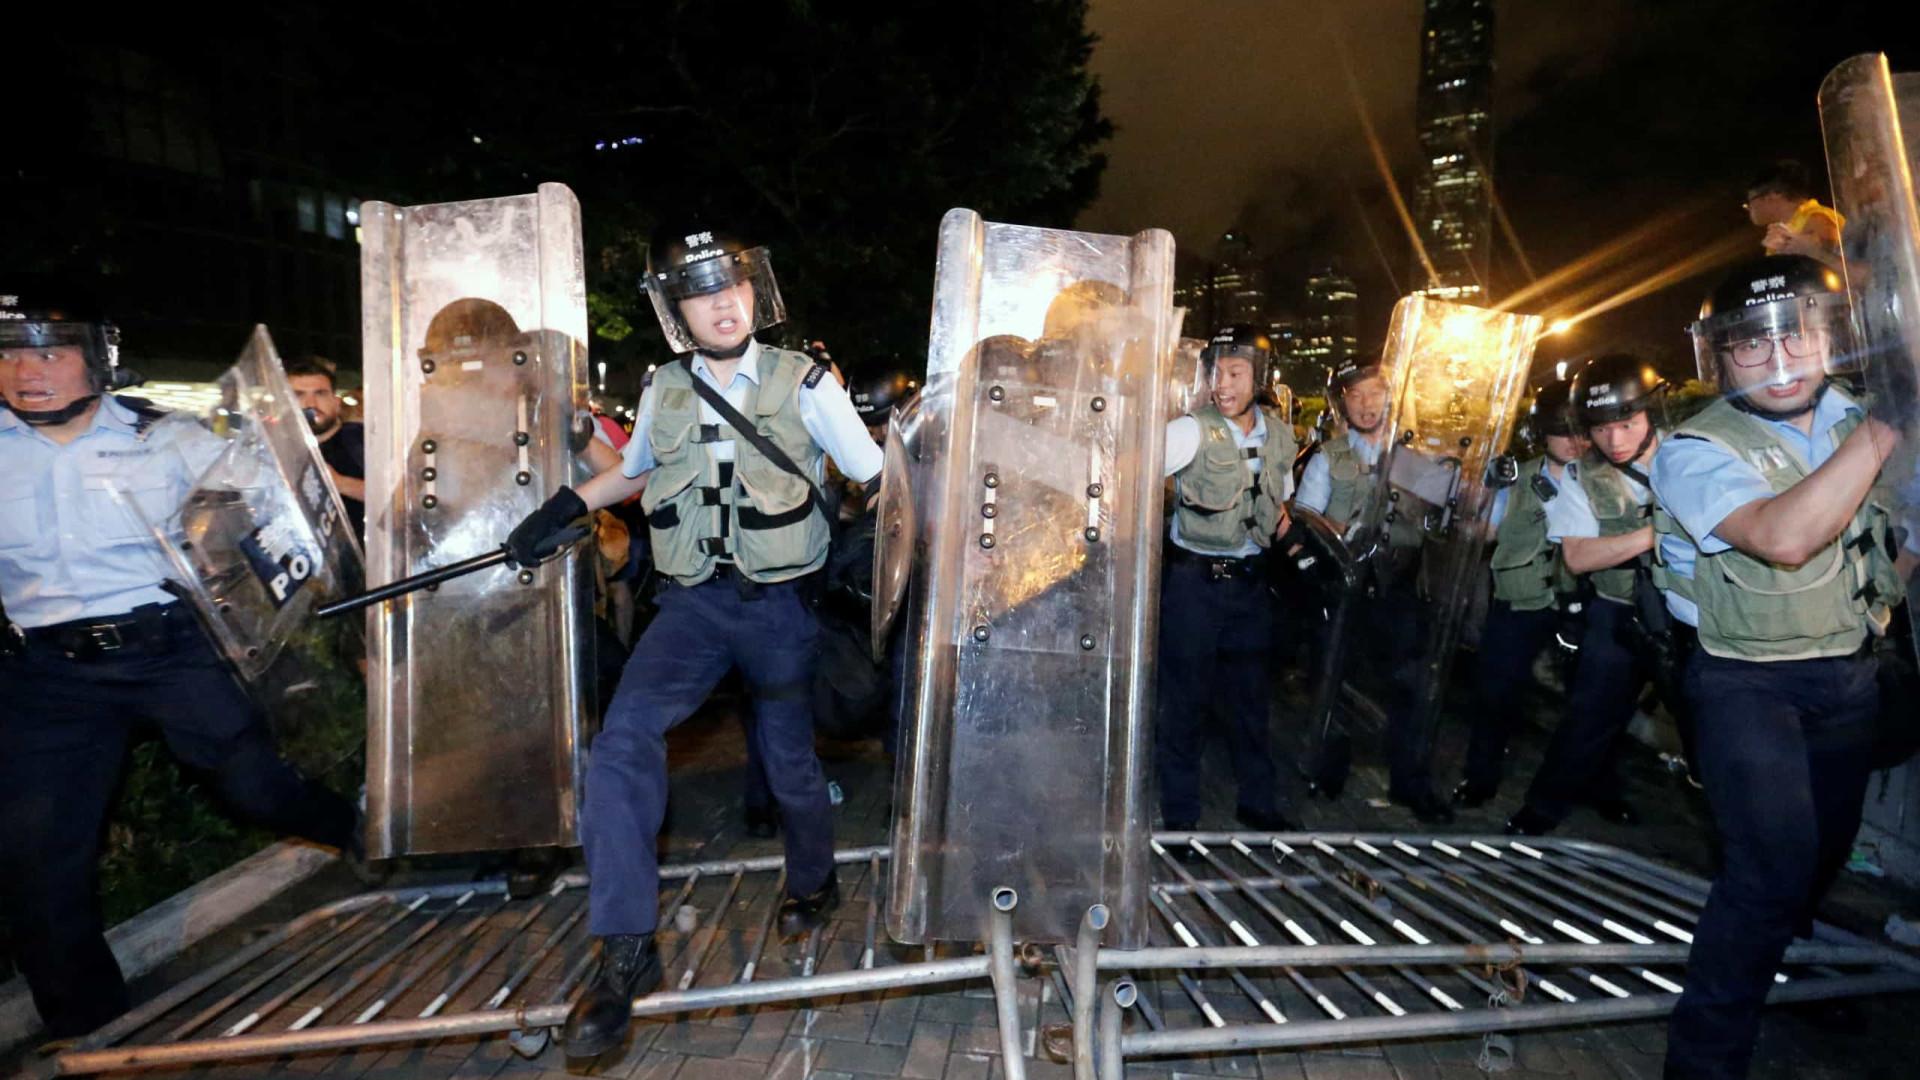 Novos protestos tomam as ruas de Hong Kong